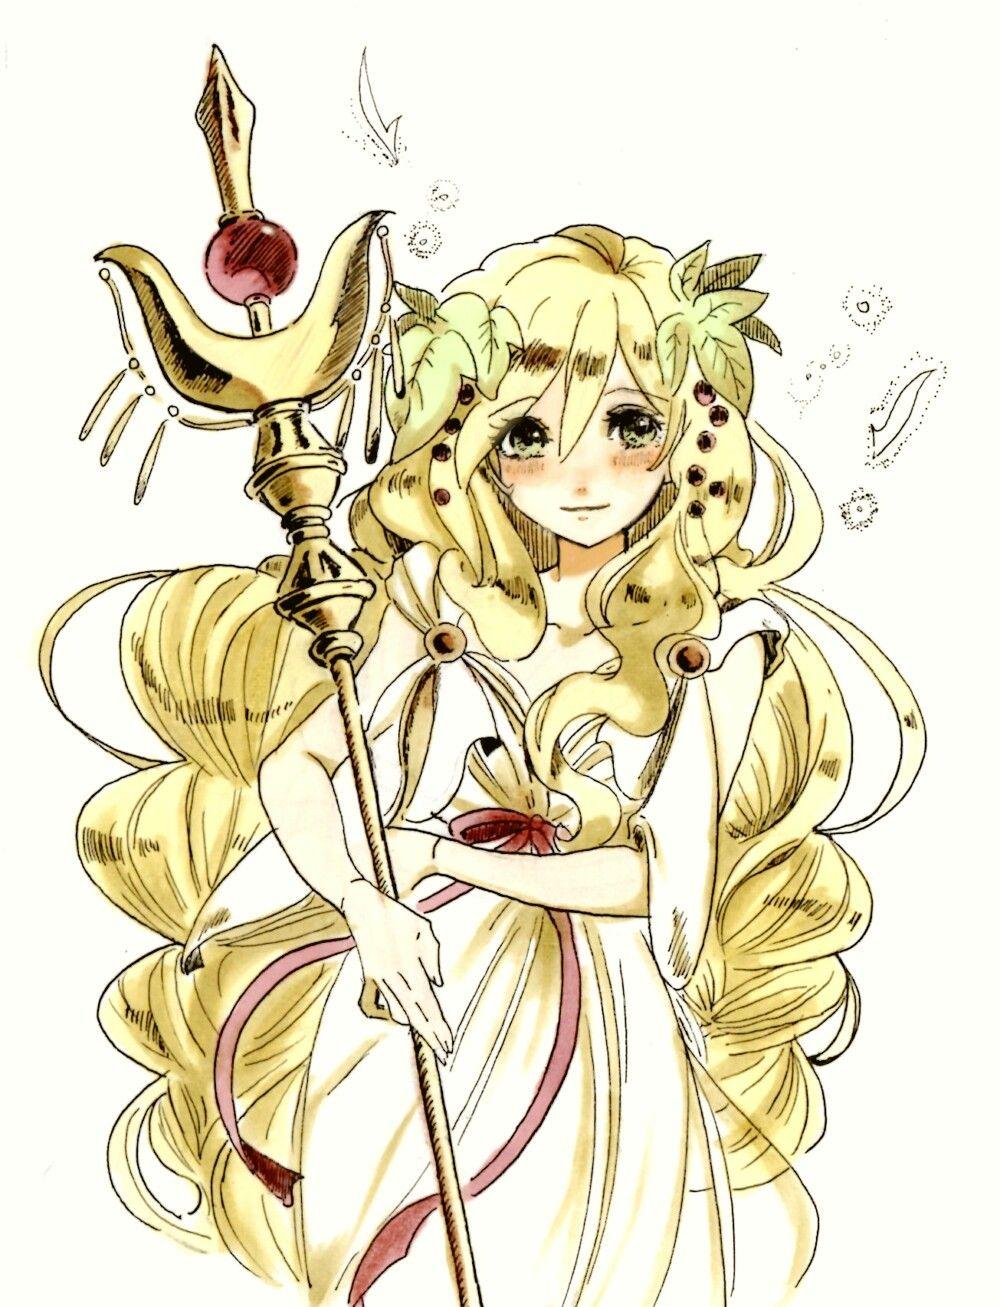 Magi Adventure of Sinbad Anime Pinterest We, Tins